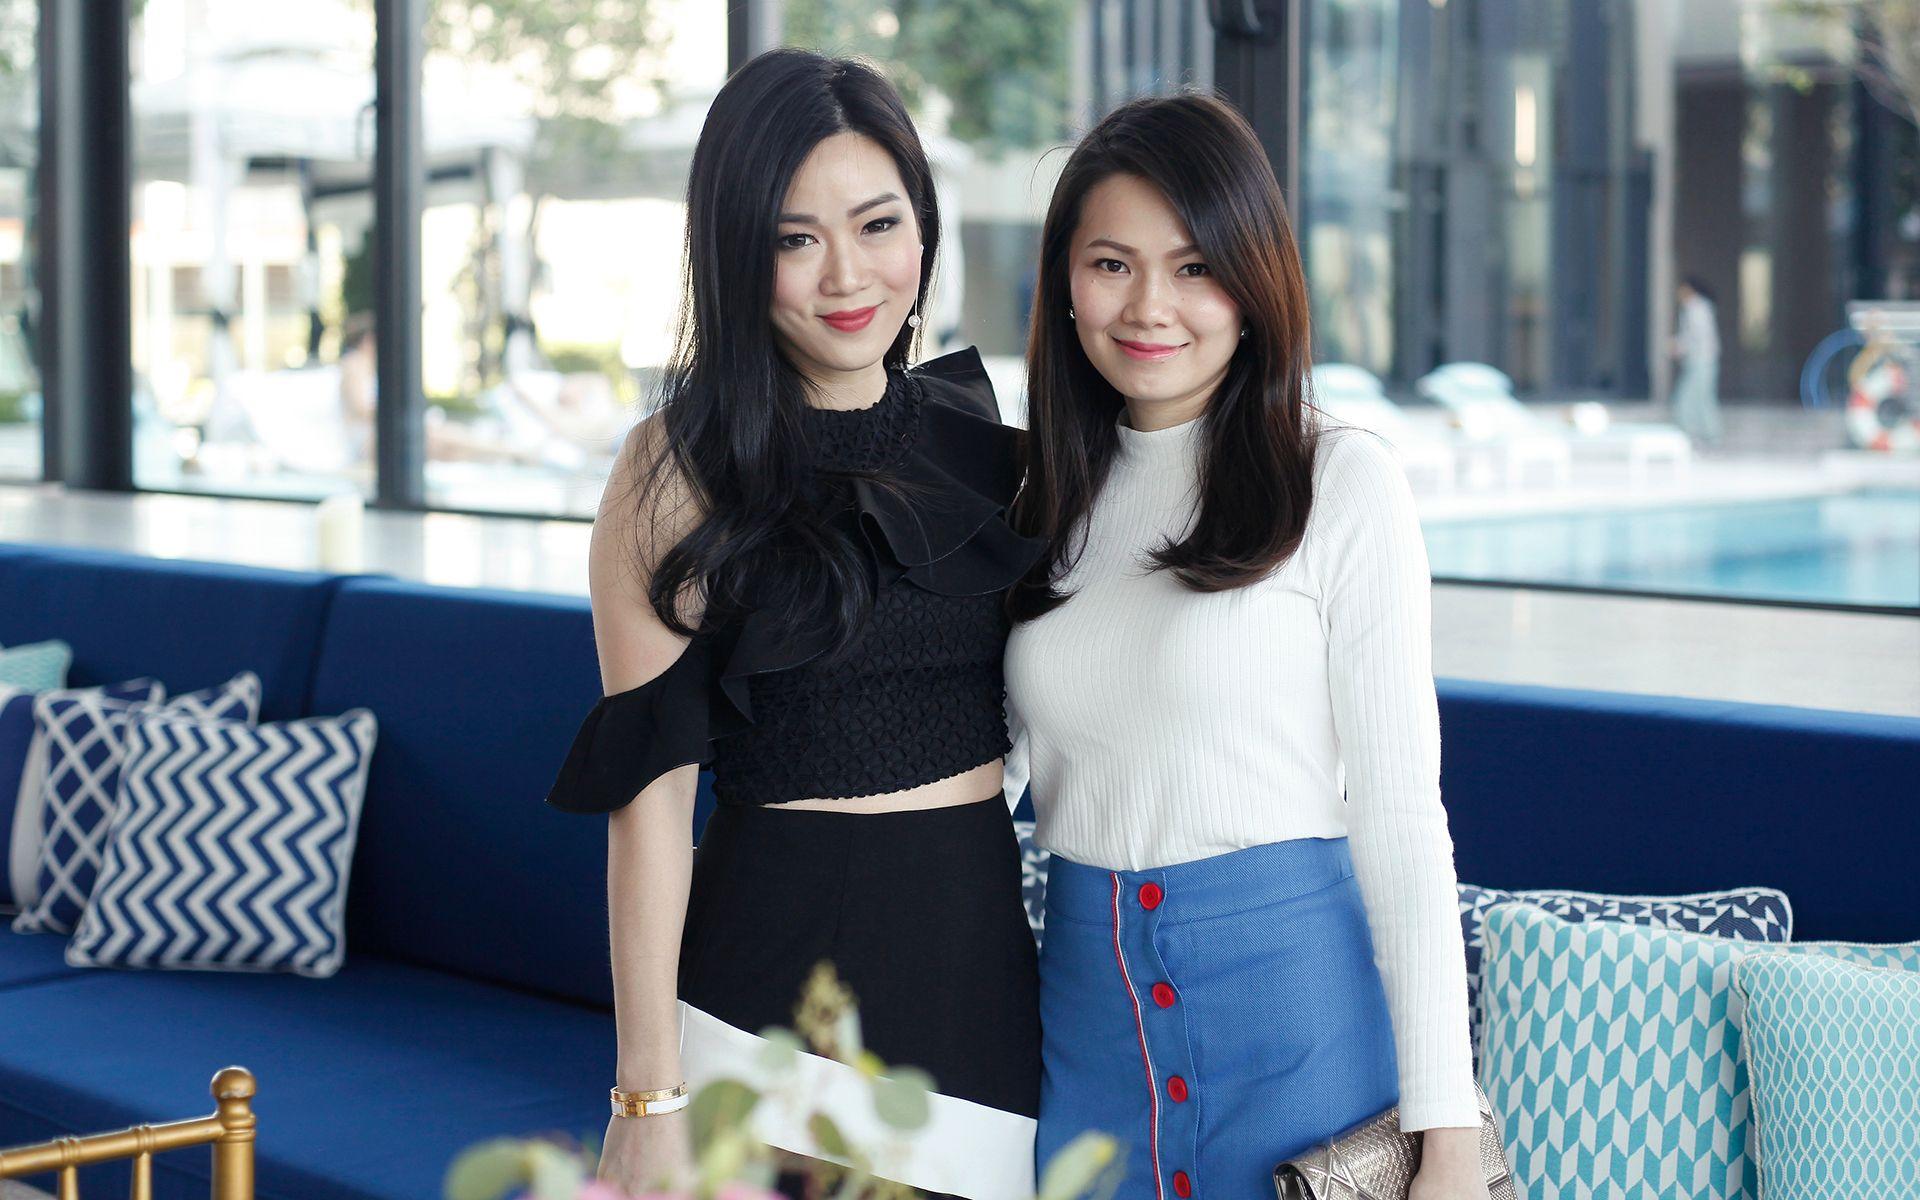 Shaine Wong and Sunny Leong